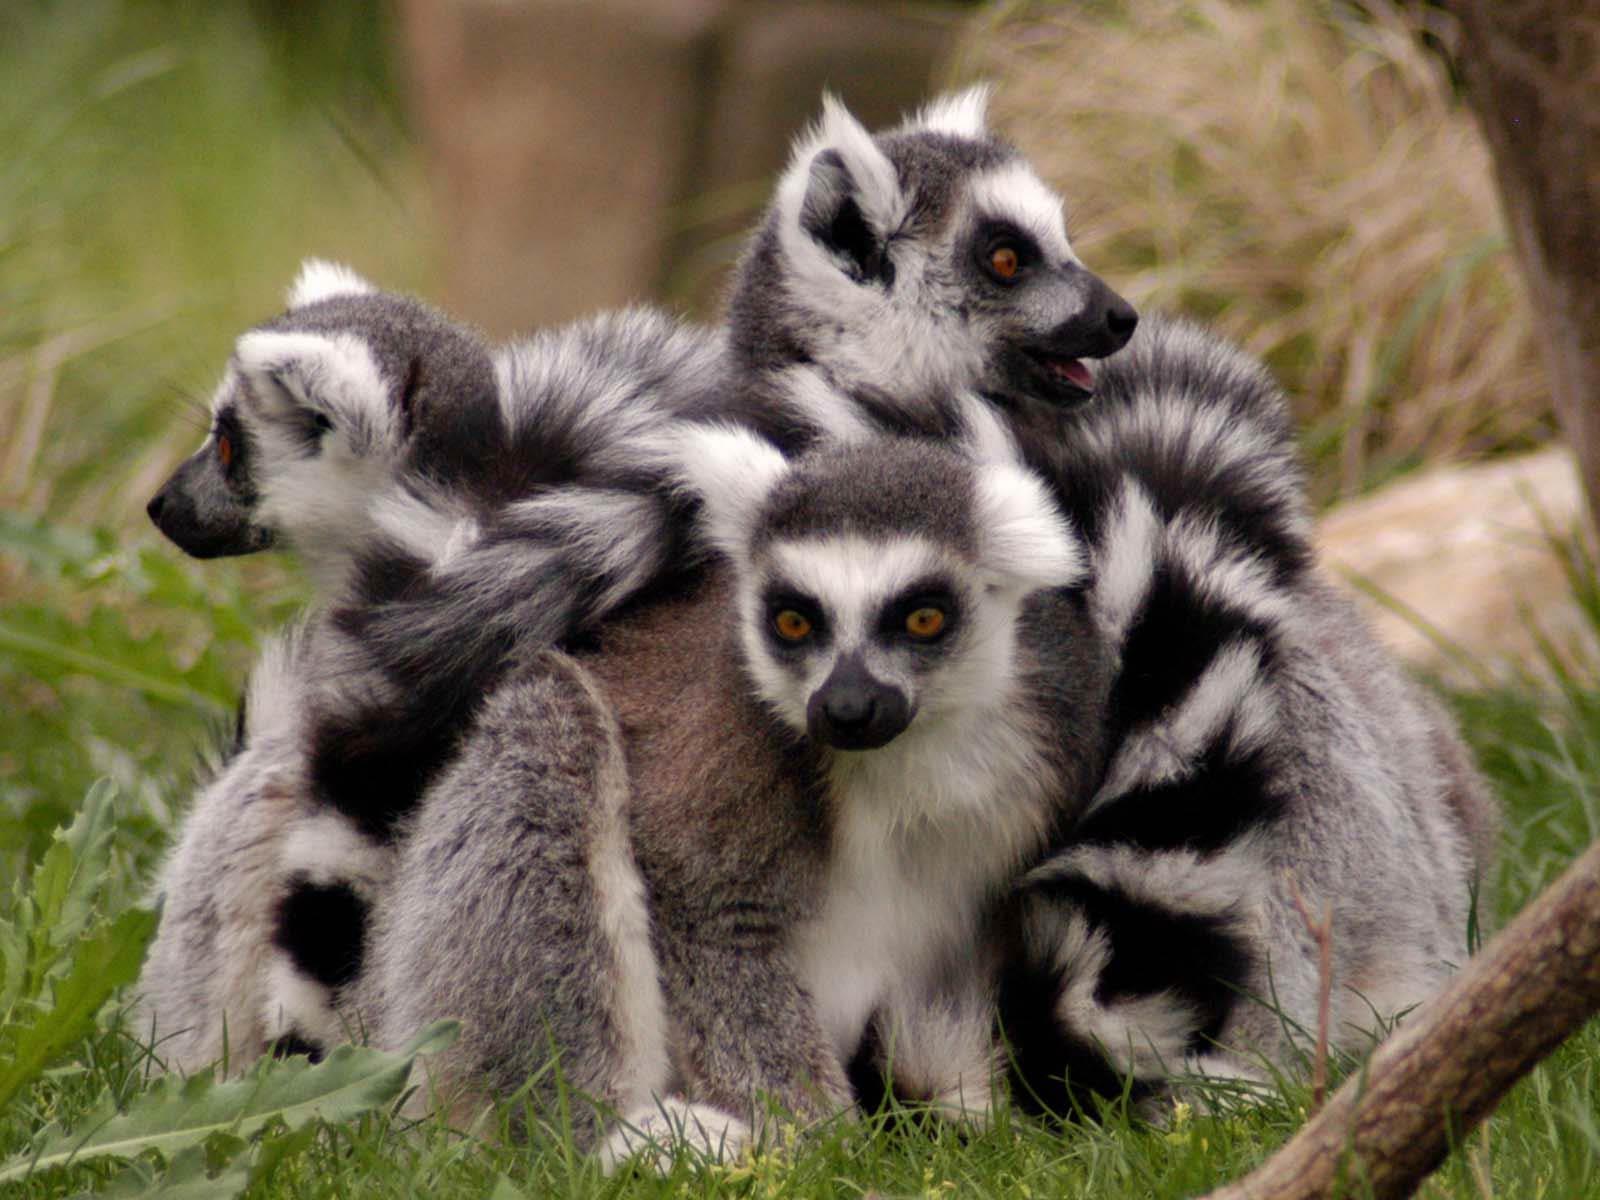 Lemur-wallpaper-6